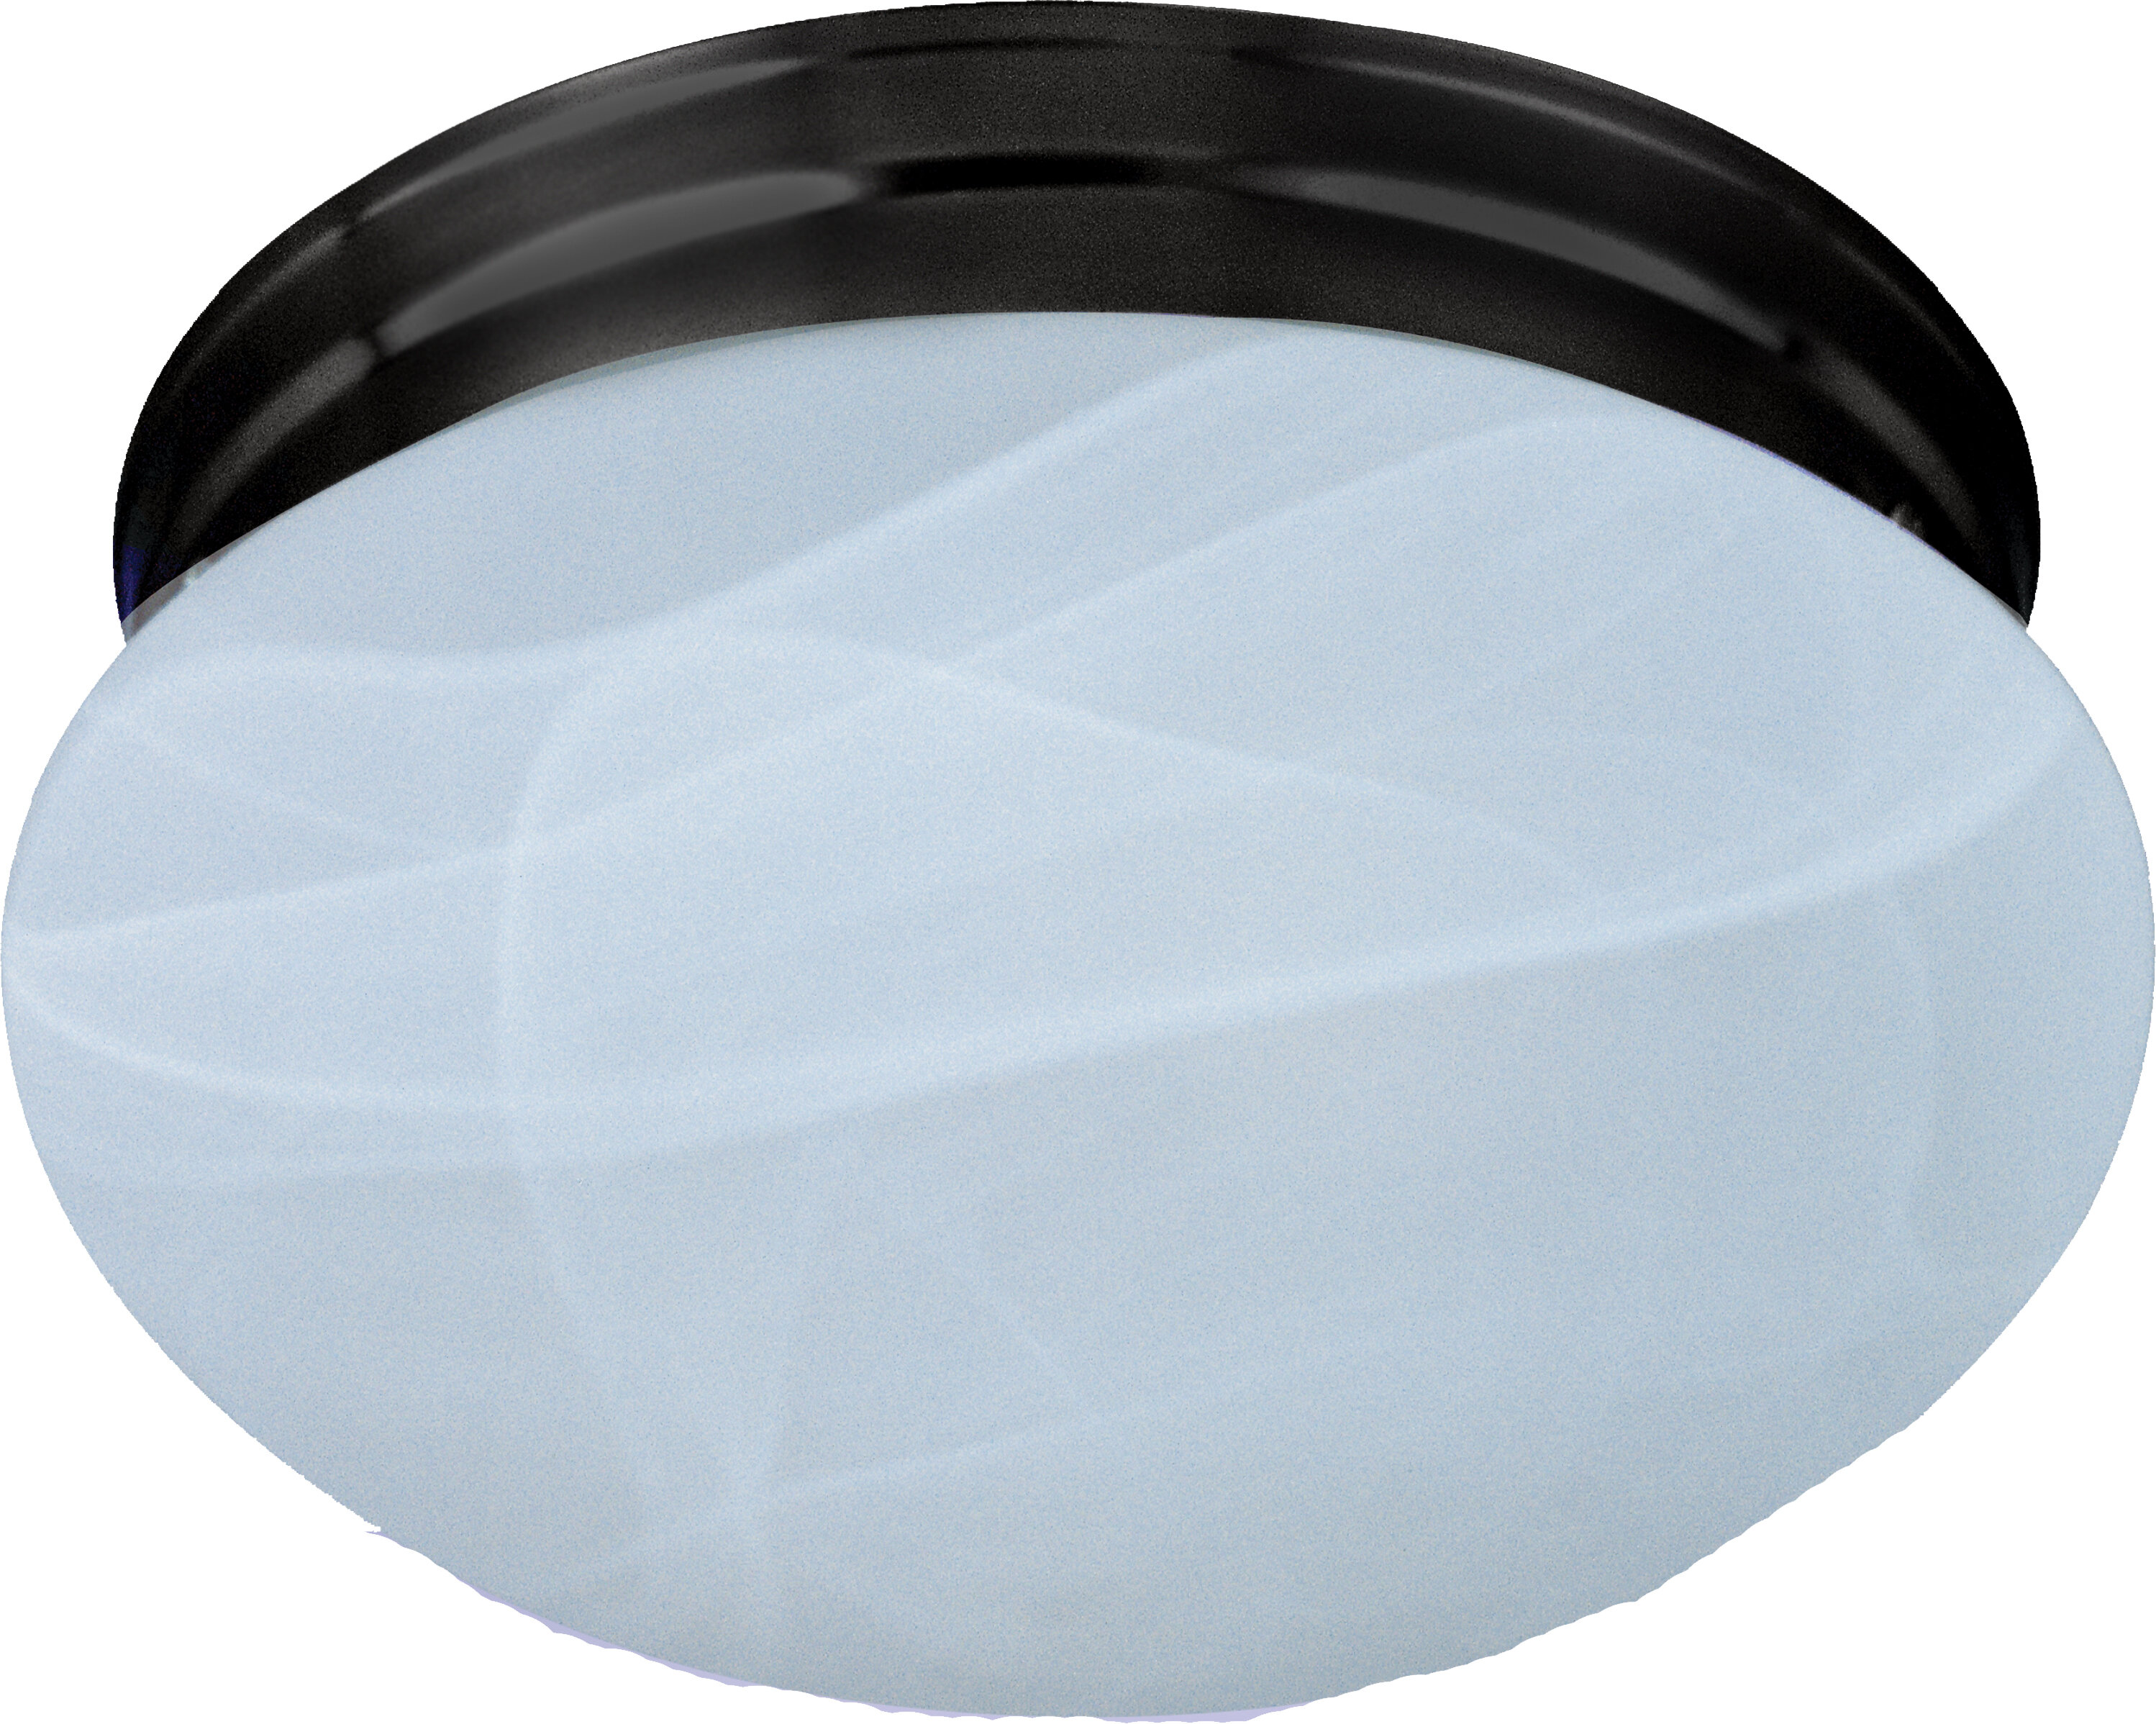 Winston Porter Cao 1 Light 7 5 Simple Bowl Flush Mount Reviews Wayfair